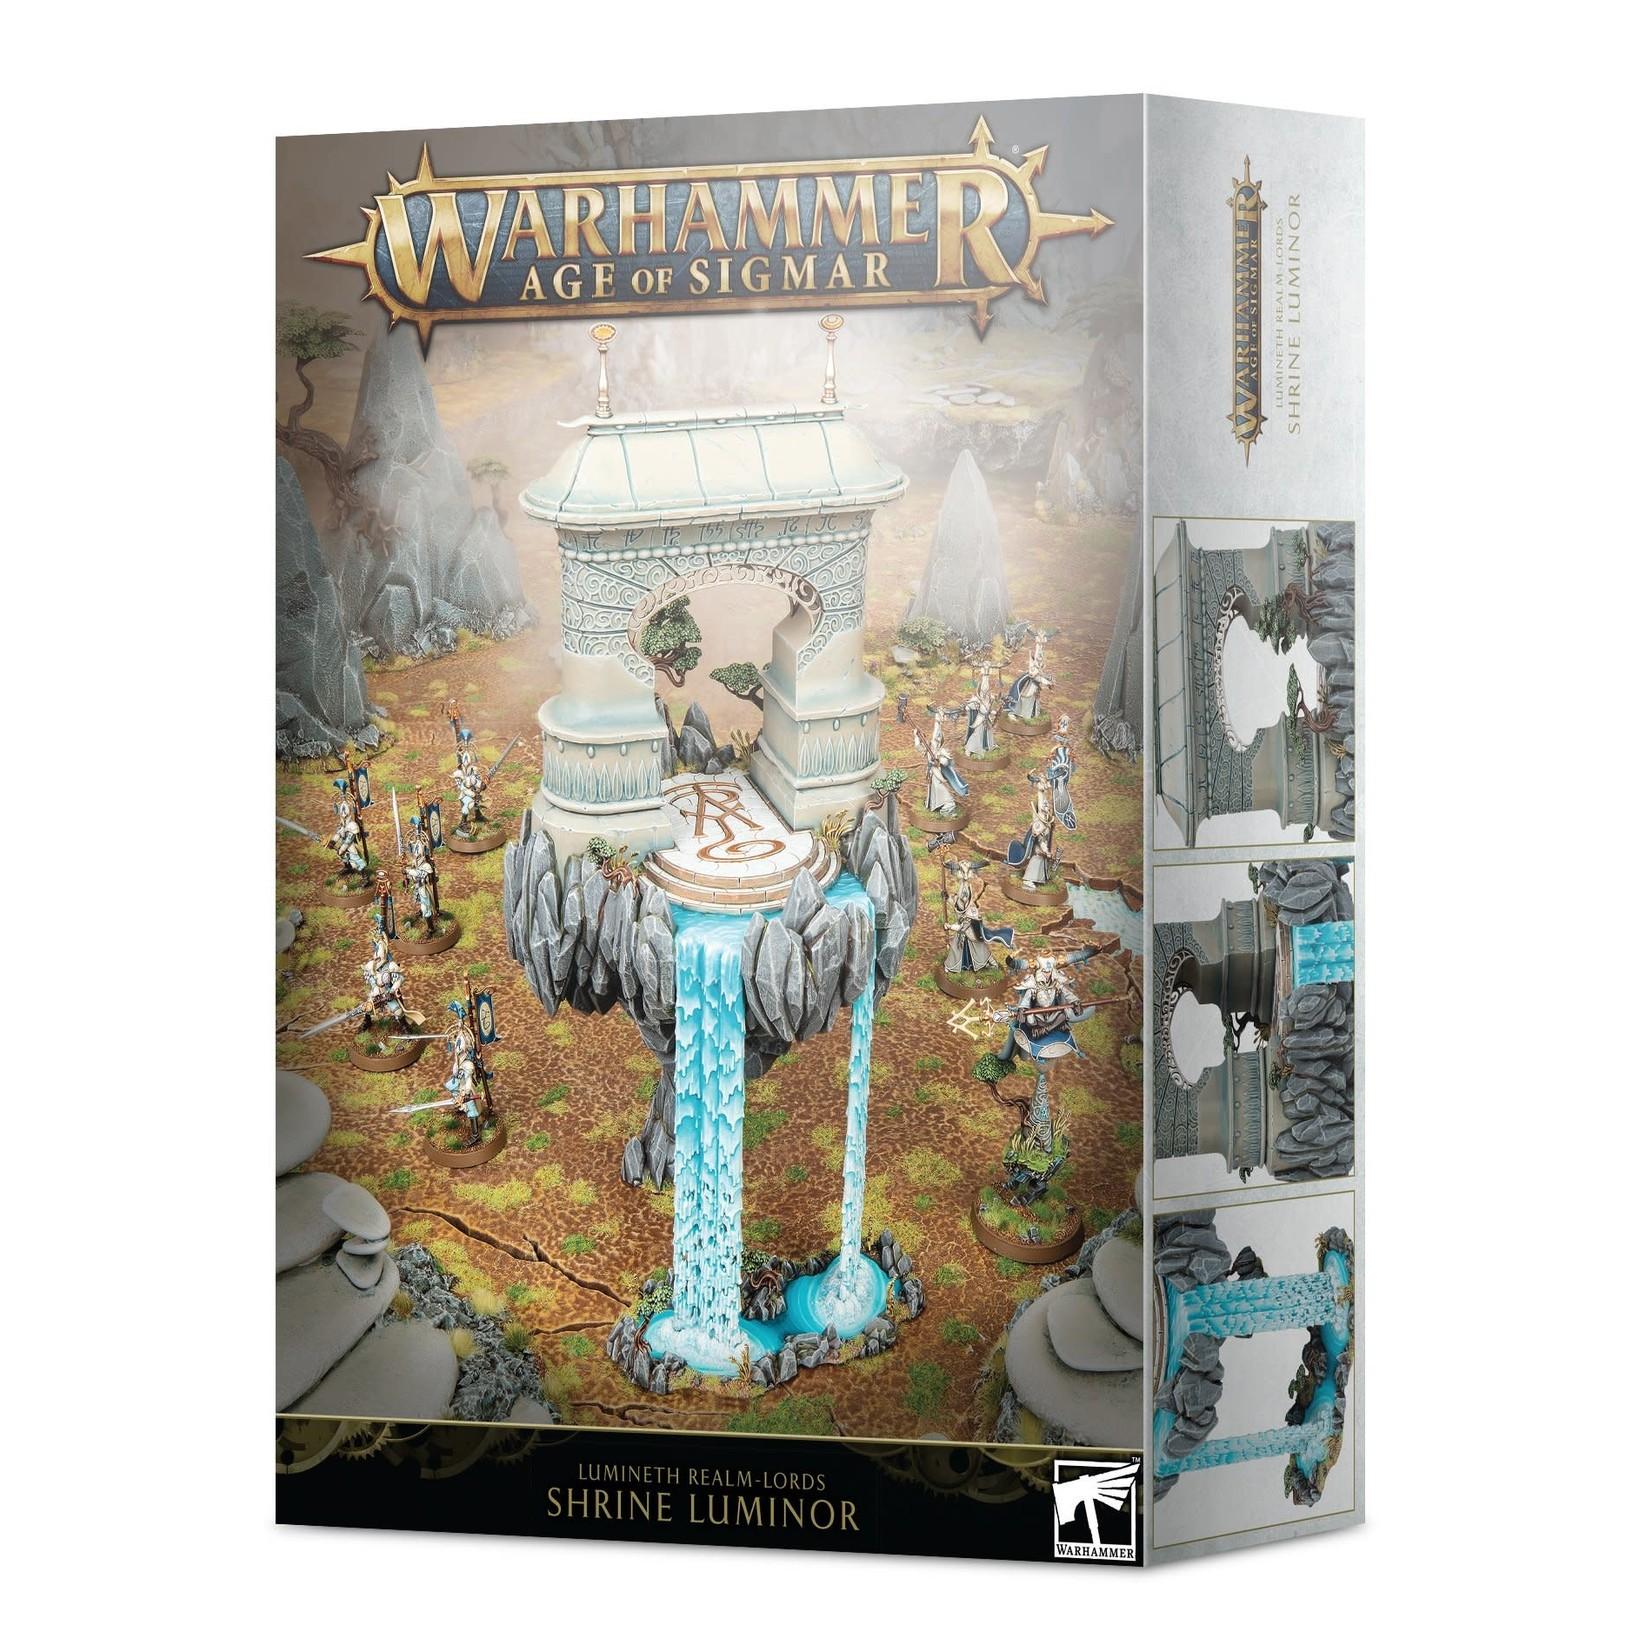 Games Workshop Warhammer Age of Sigmar: Lumineth Realm-Lords - Shrine Luminor